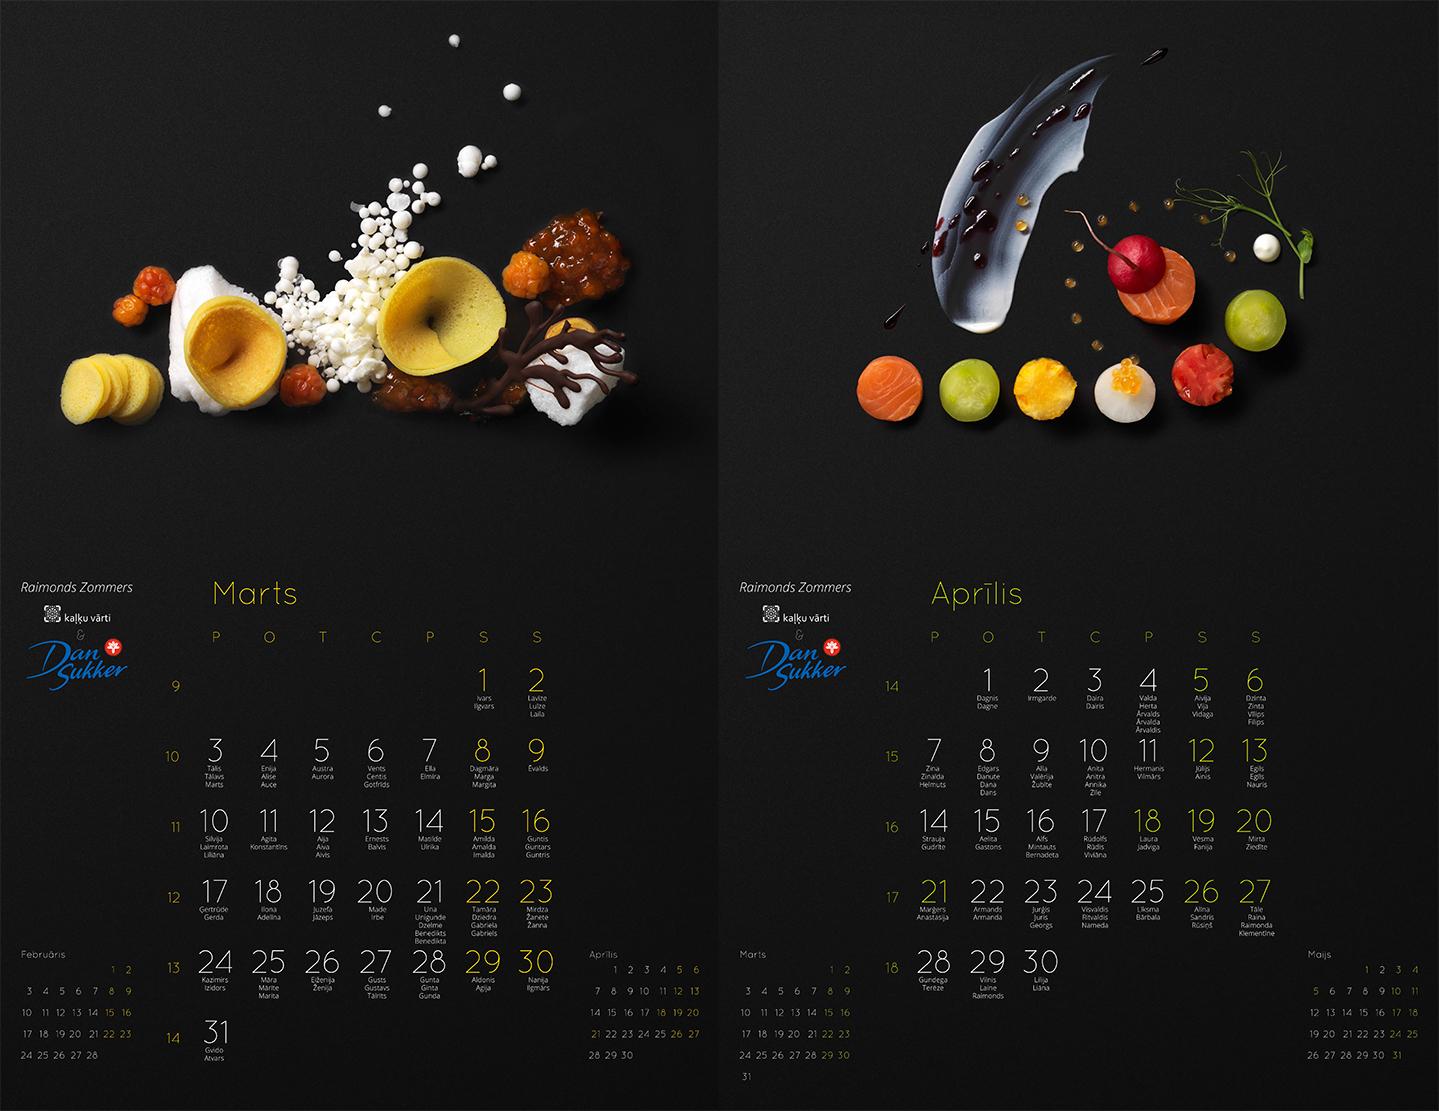 marts aprilis 1111 Nordic Sugar Sienas kalendars.jpg